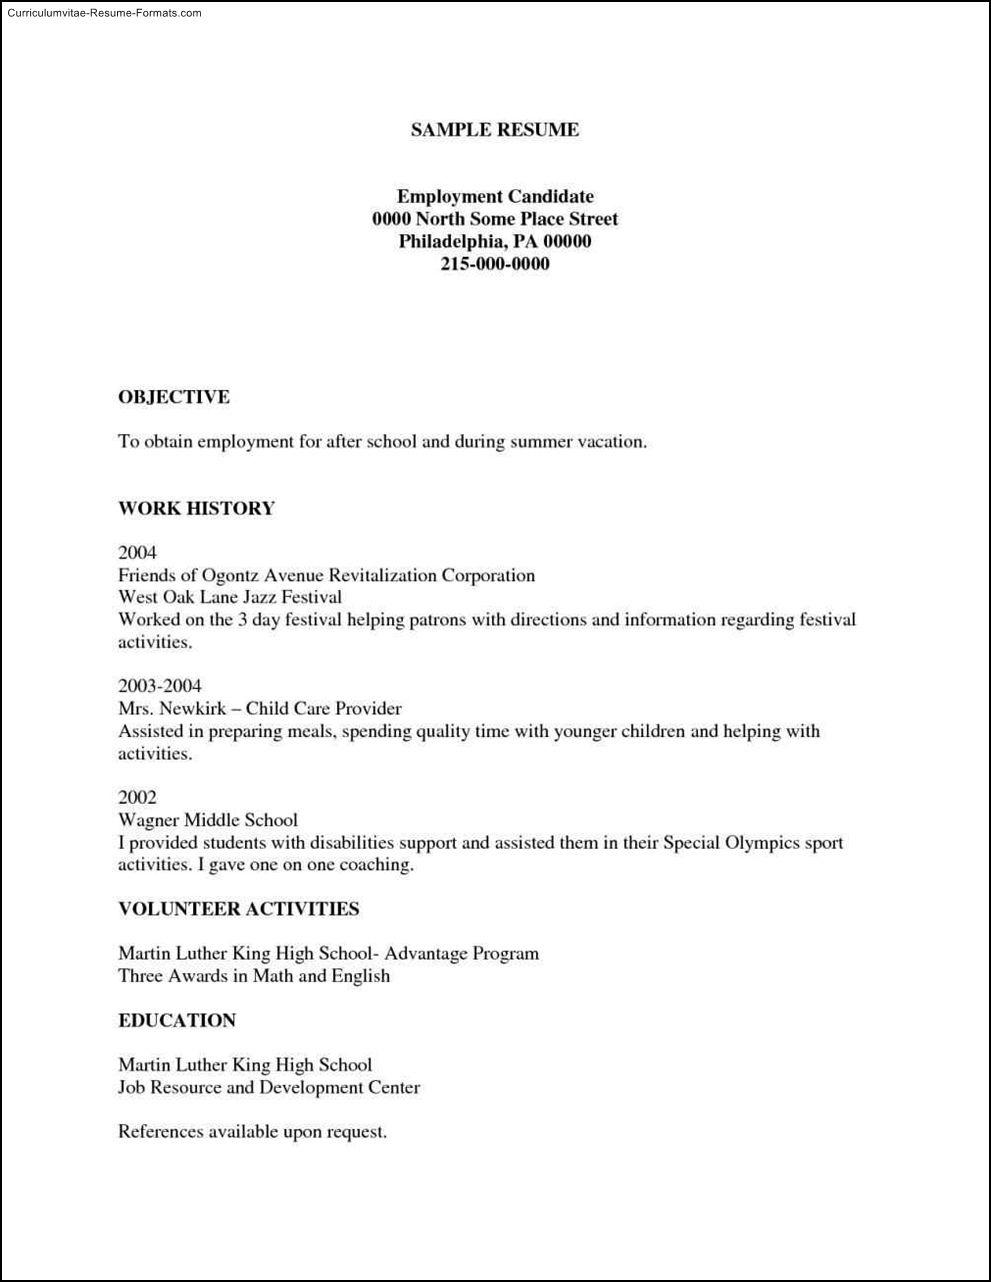 Free Printable Resumes Templates Free Samples Examples Format Resume - Free Printable Resume Templates